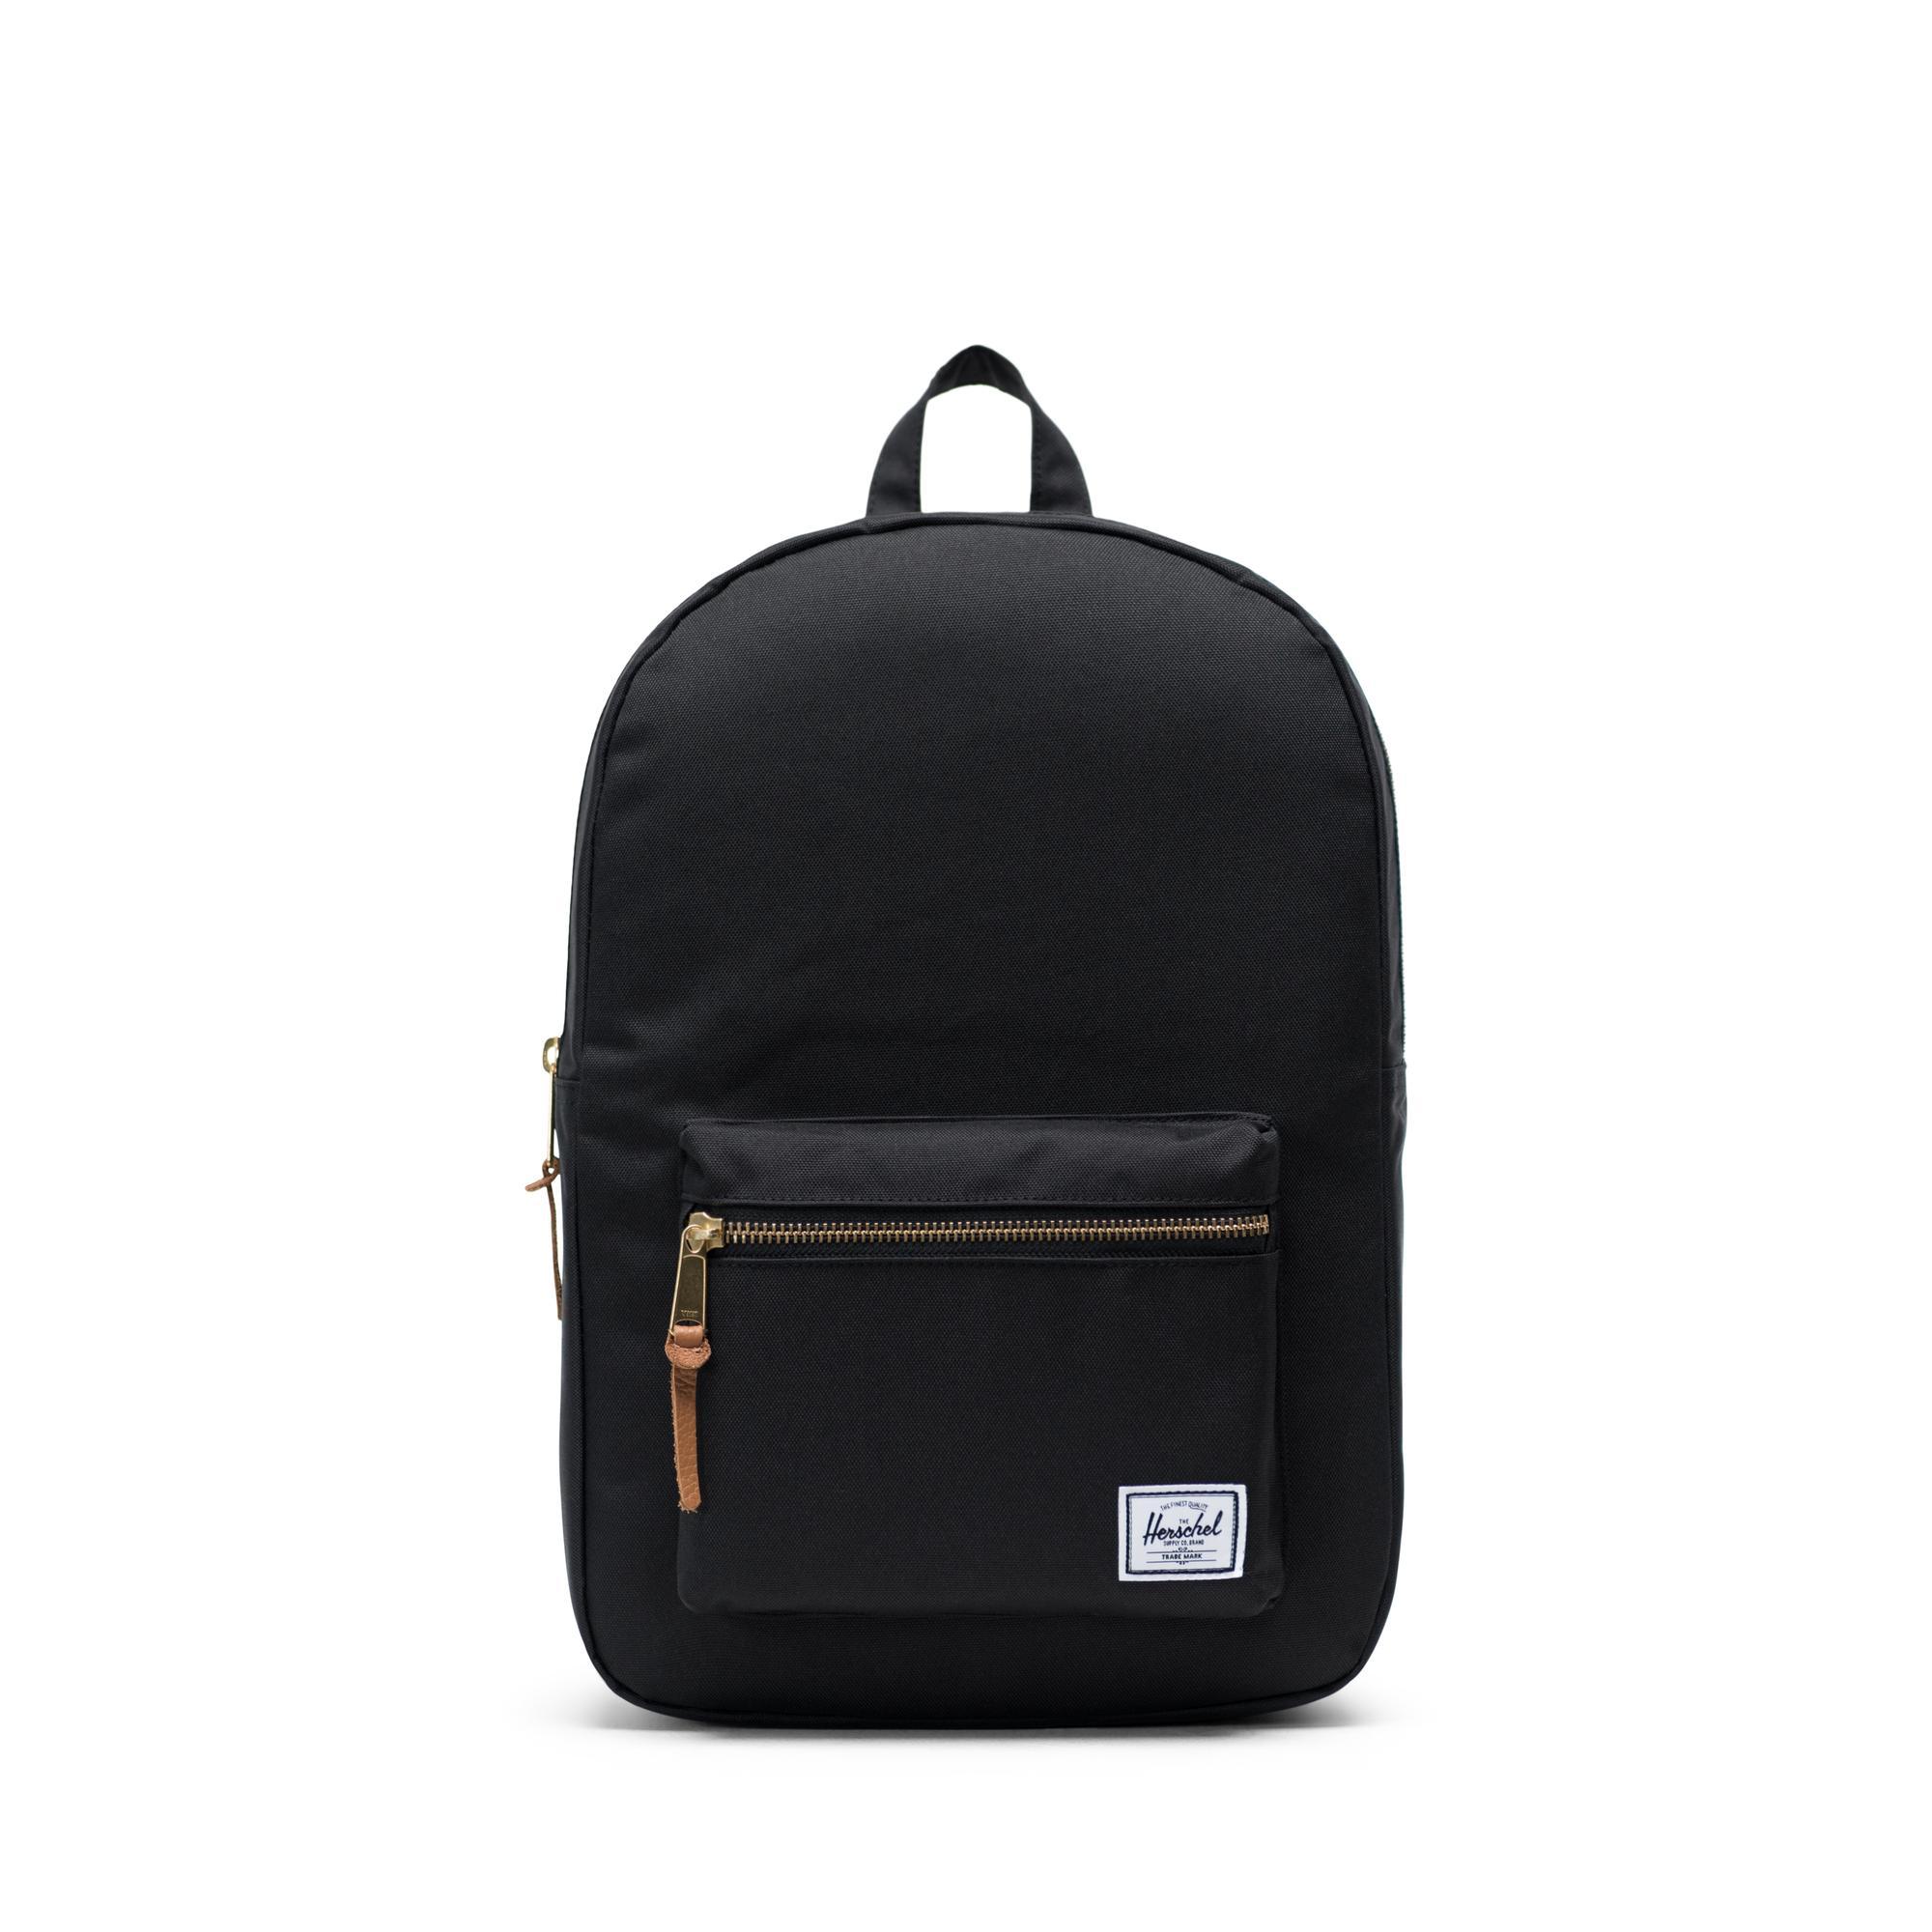 6ae1d56eb7f3 Settlement Backpack Mid-Volume